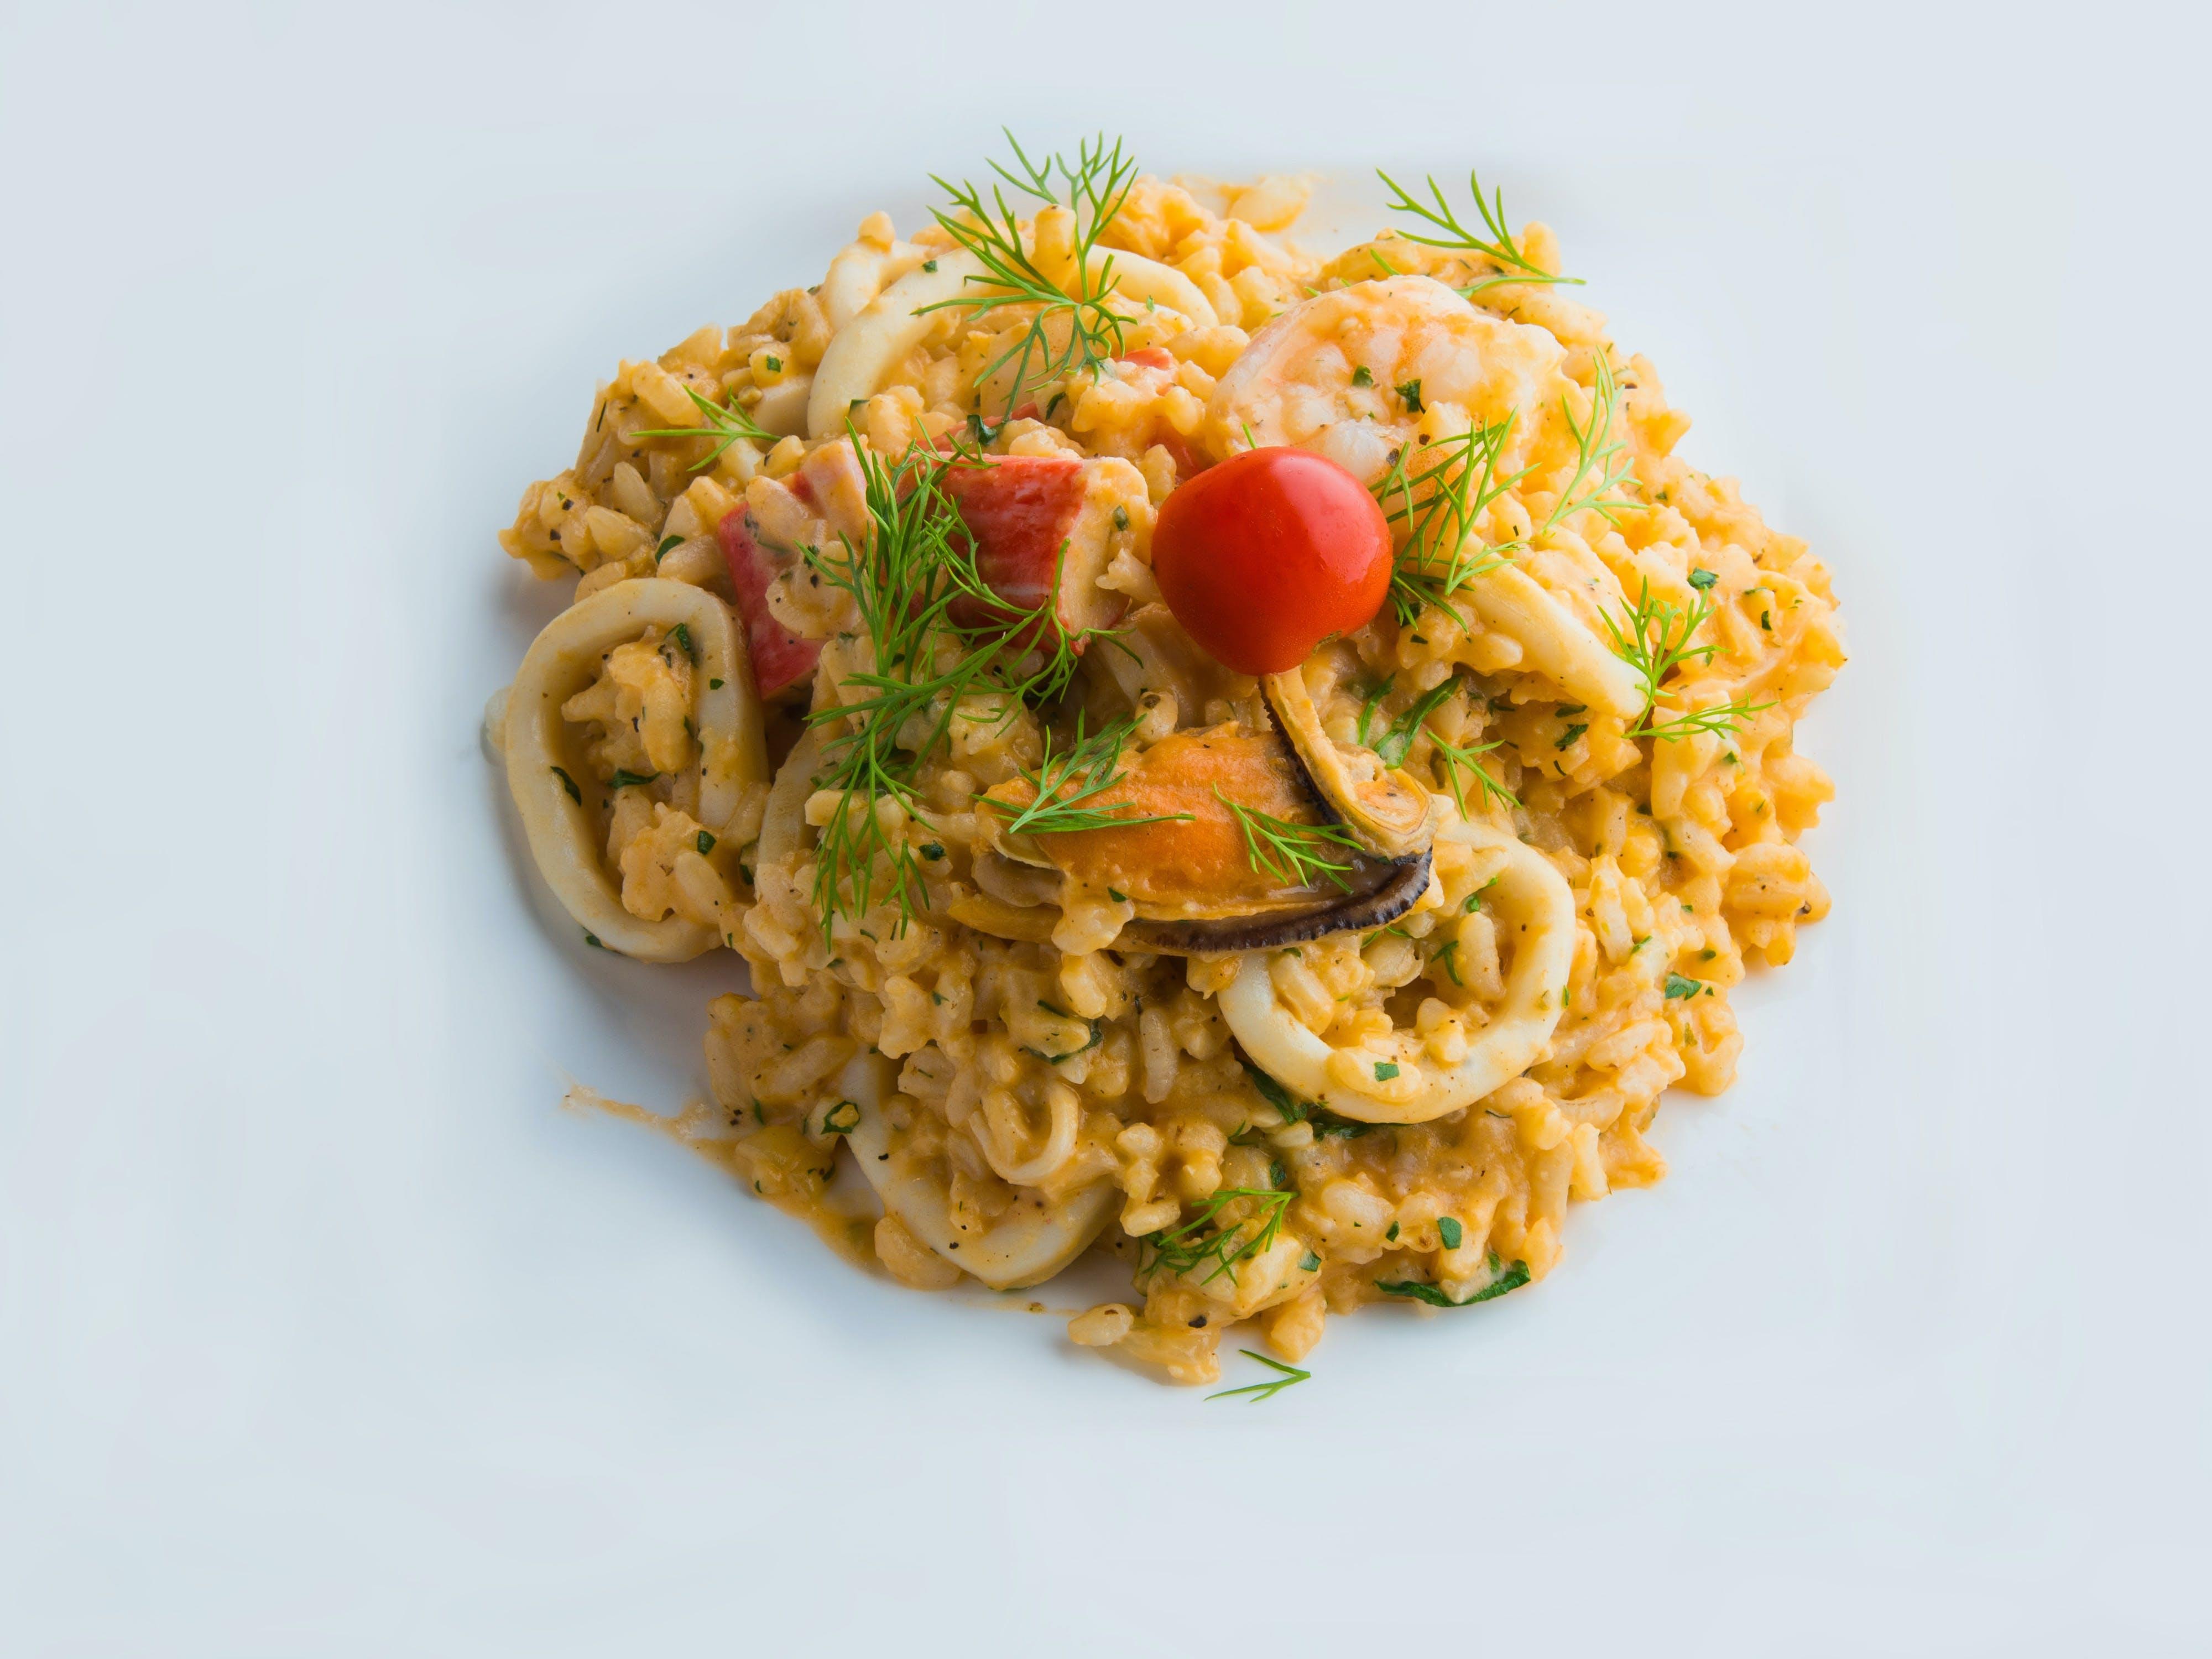 Free stock photo of arab cuisine, arab food, Arabic cuisine, balanced diet